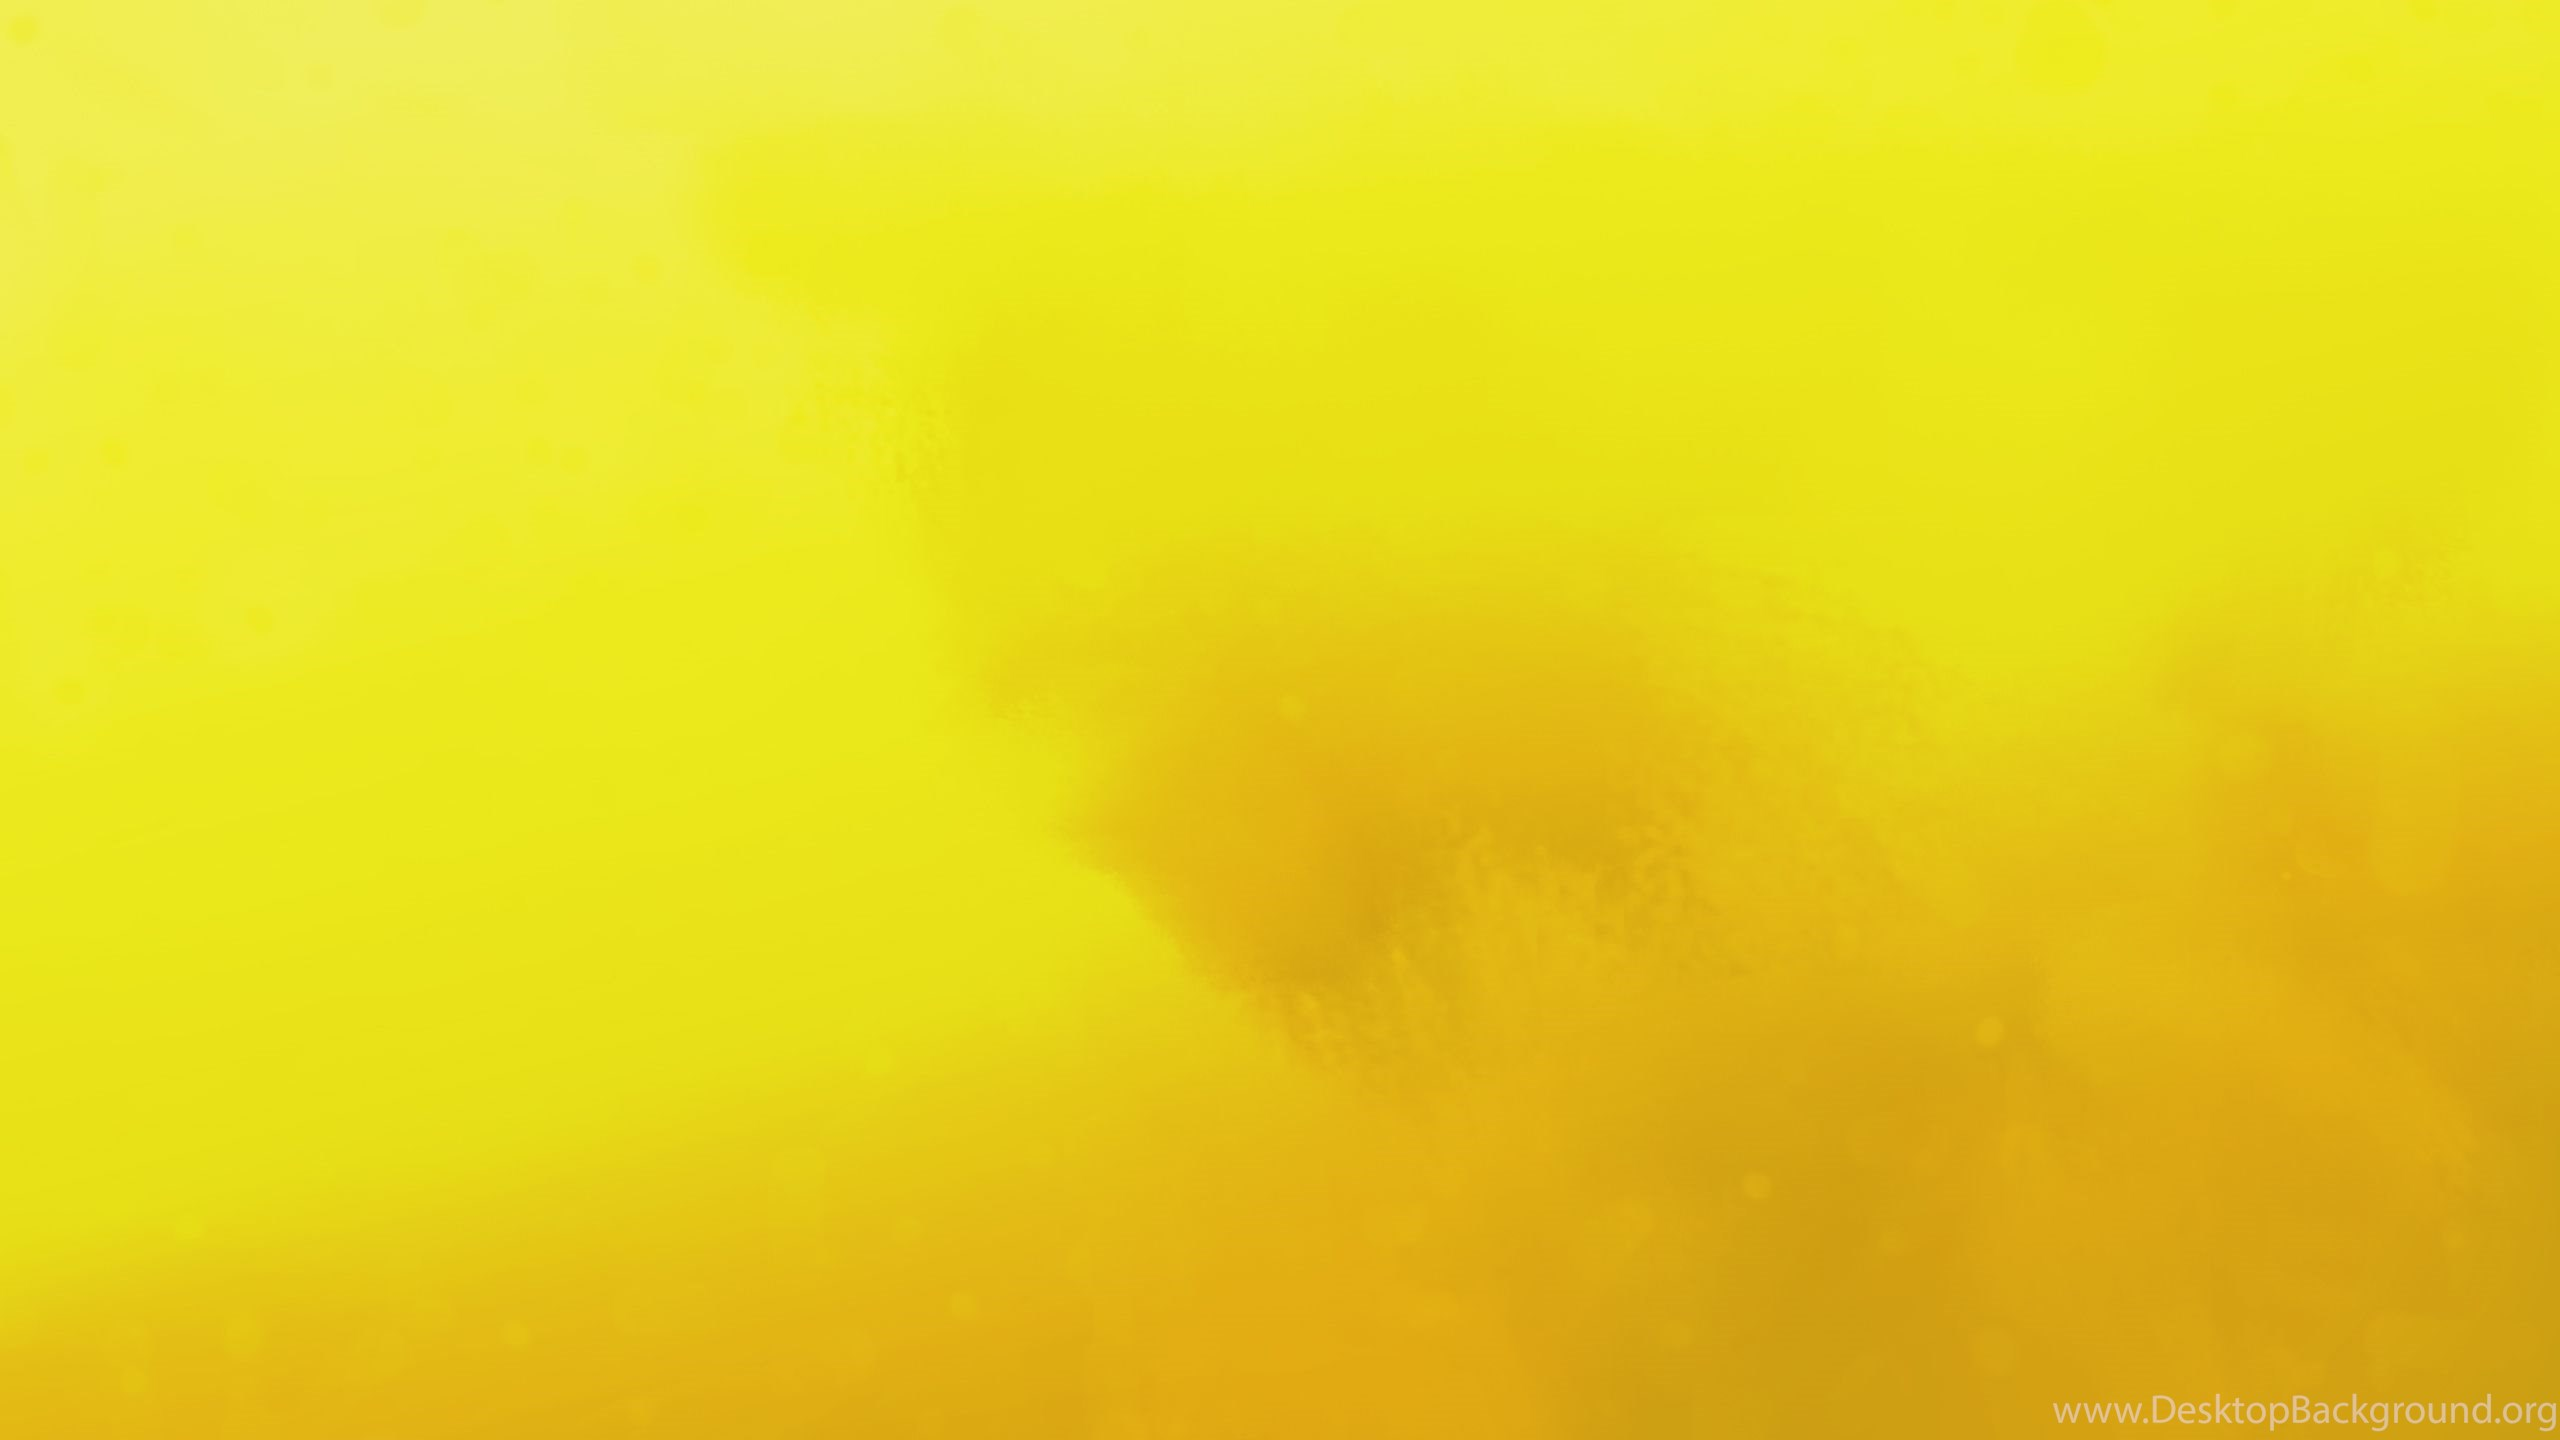 Light Yellow Color Wallpaper. Desktop Background